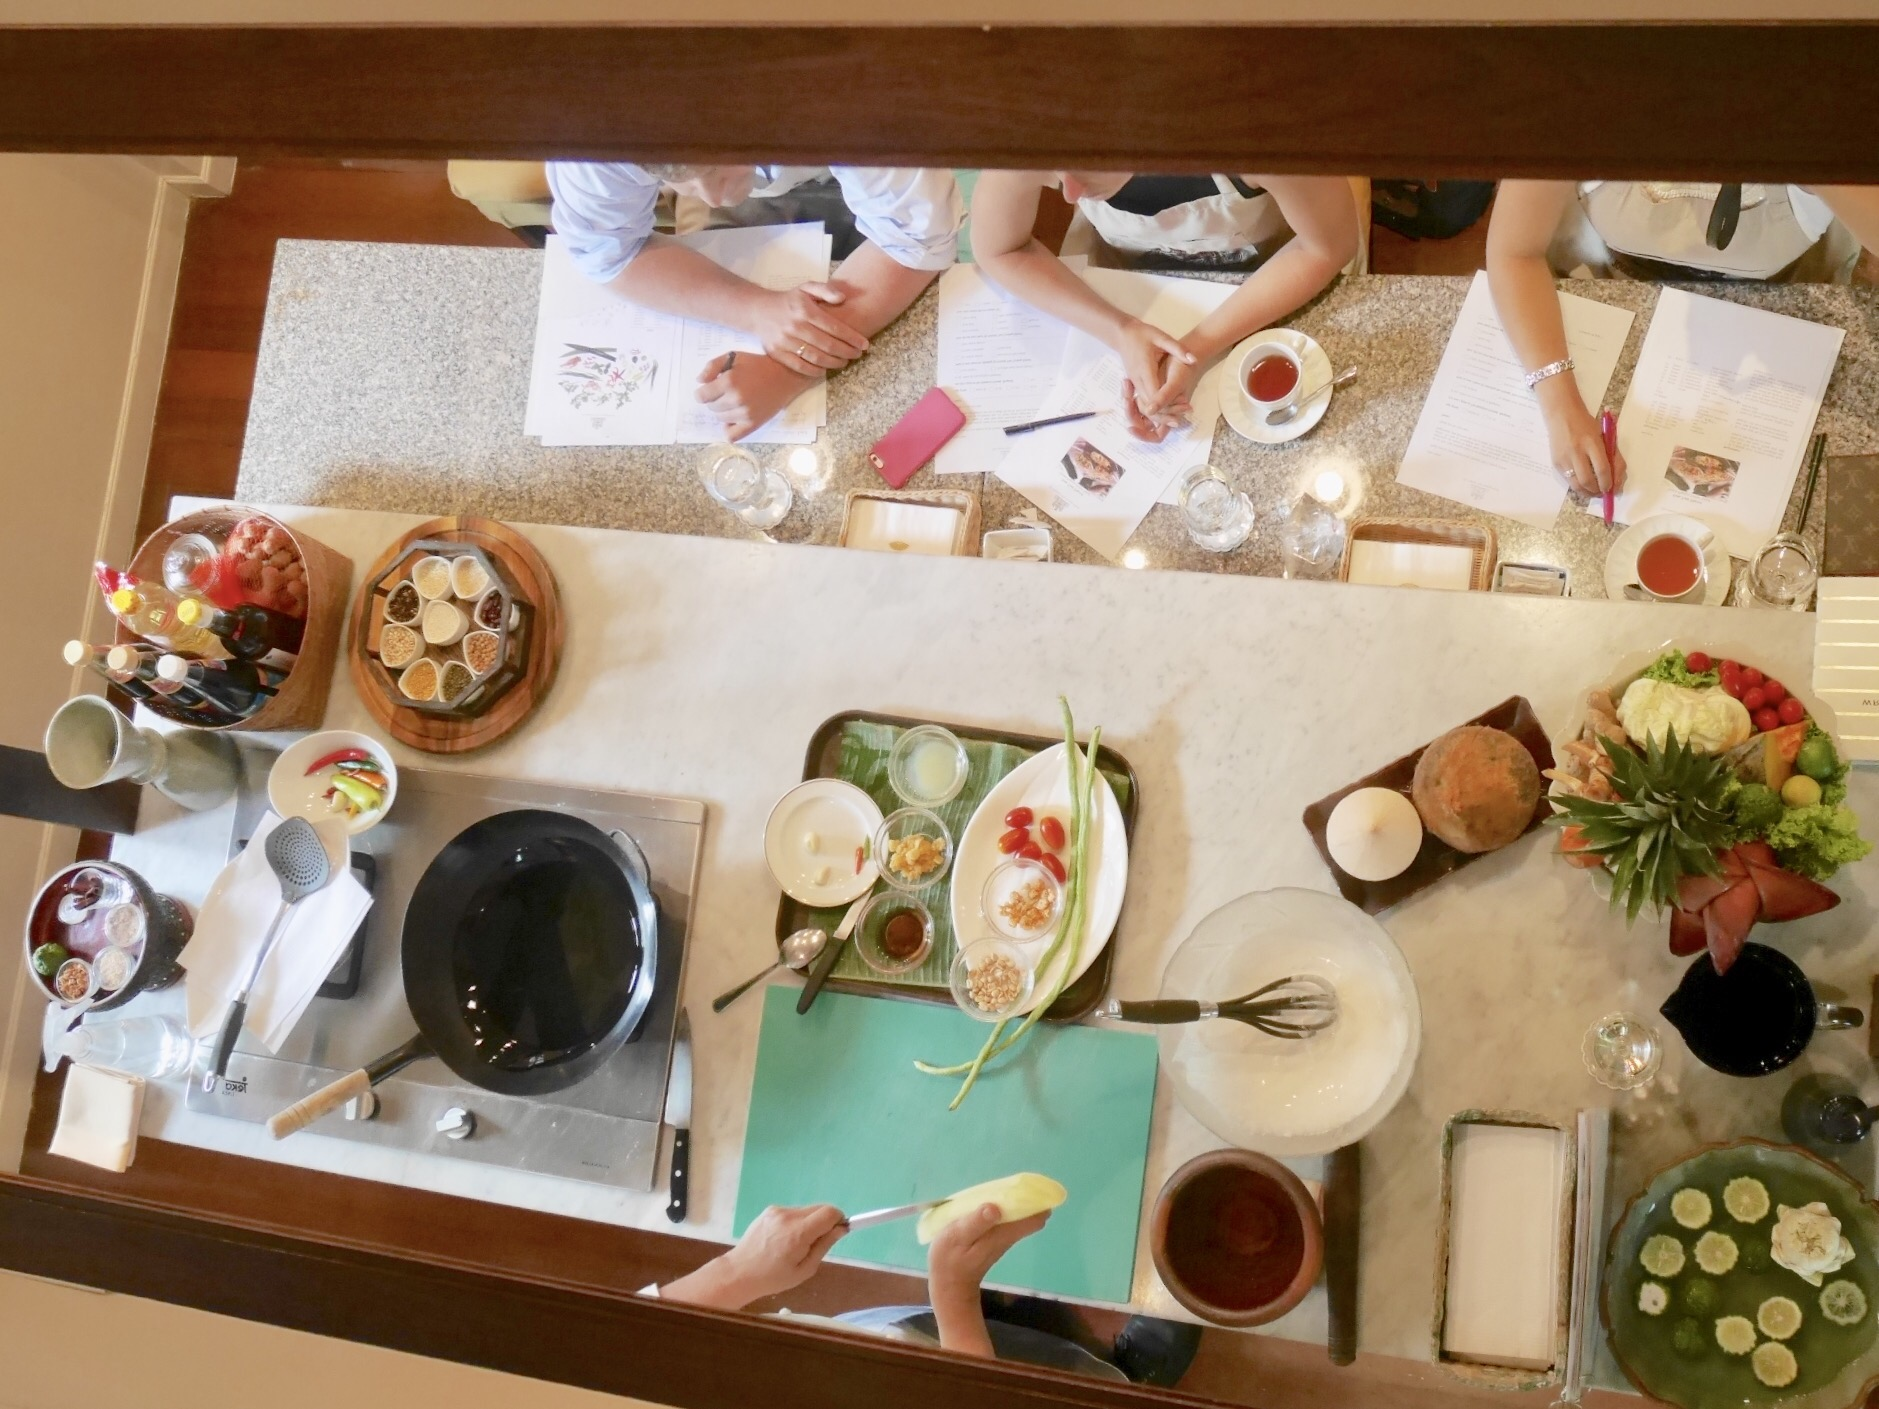 img 9067 1 - The Oriental Thai Cooking School - マンダリンオリエンタルバンコクのおもてなし空間で体験する絶品タイ料理教室